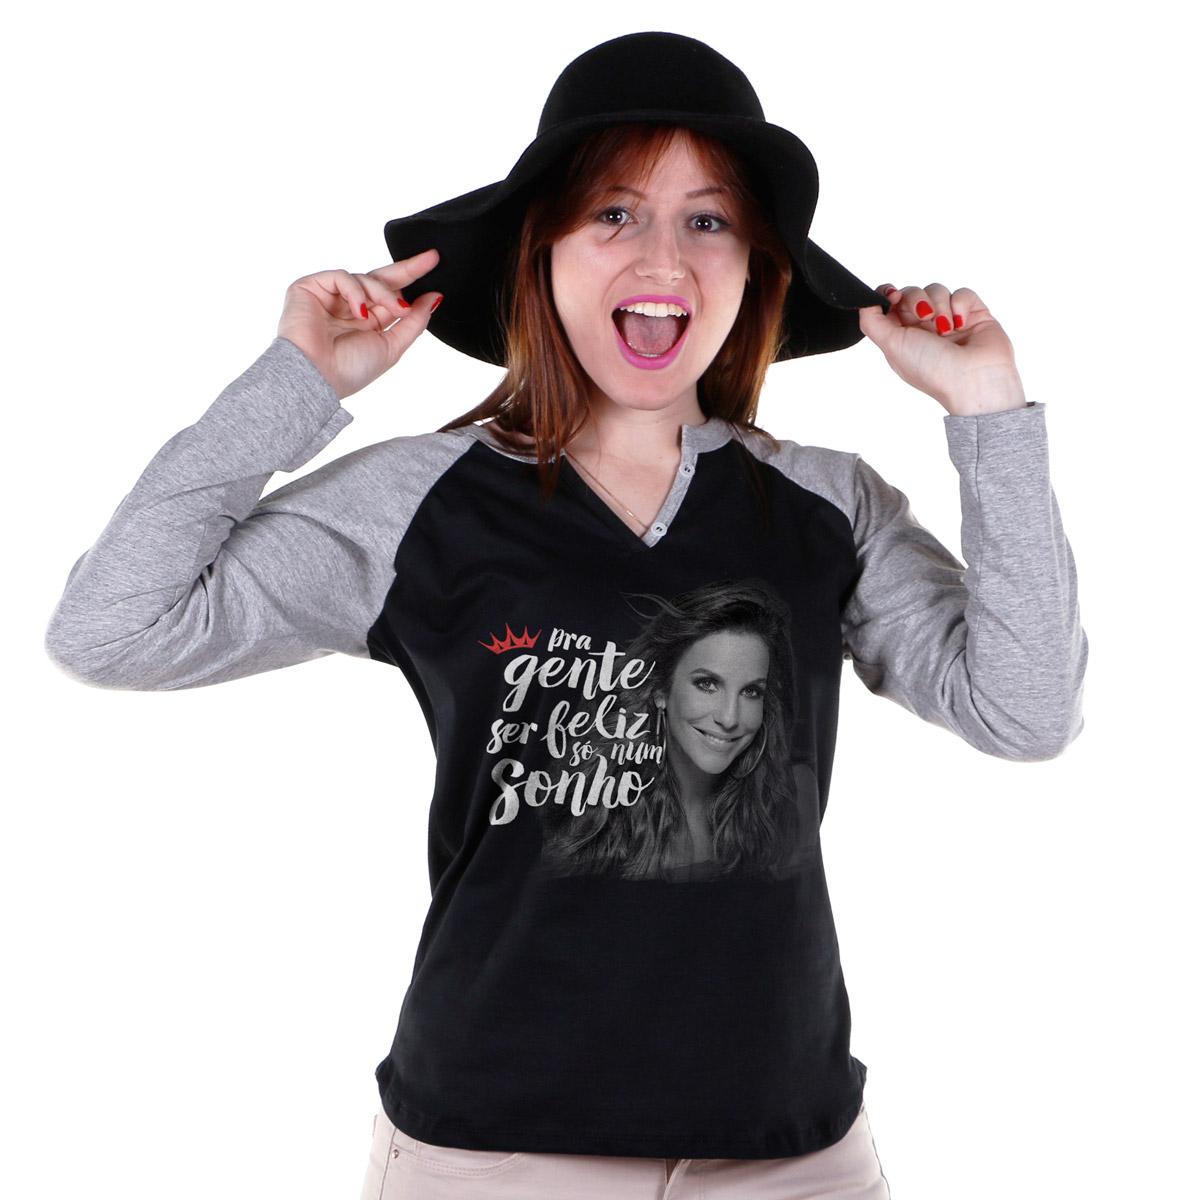 Camiseta Raglan Feminina Ivete Sangalo Pra Gente Ser Feliz